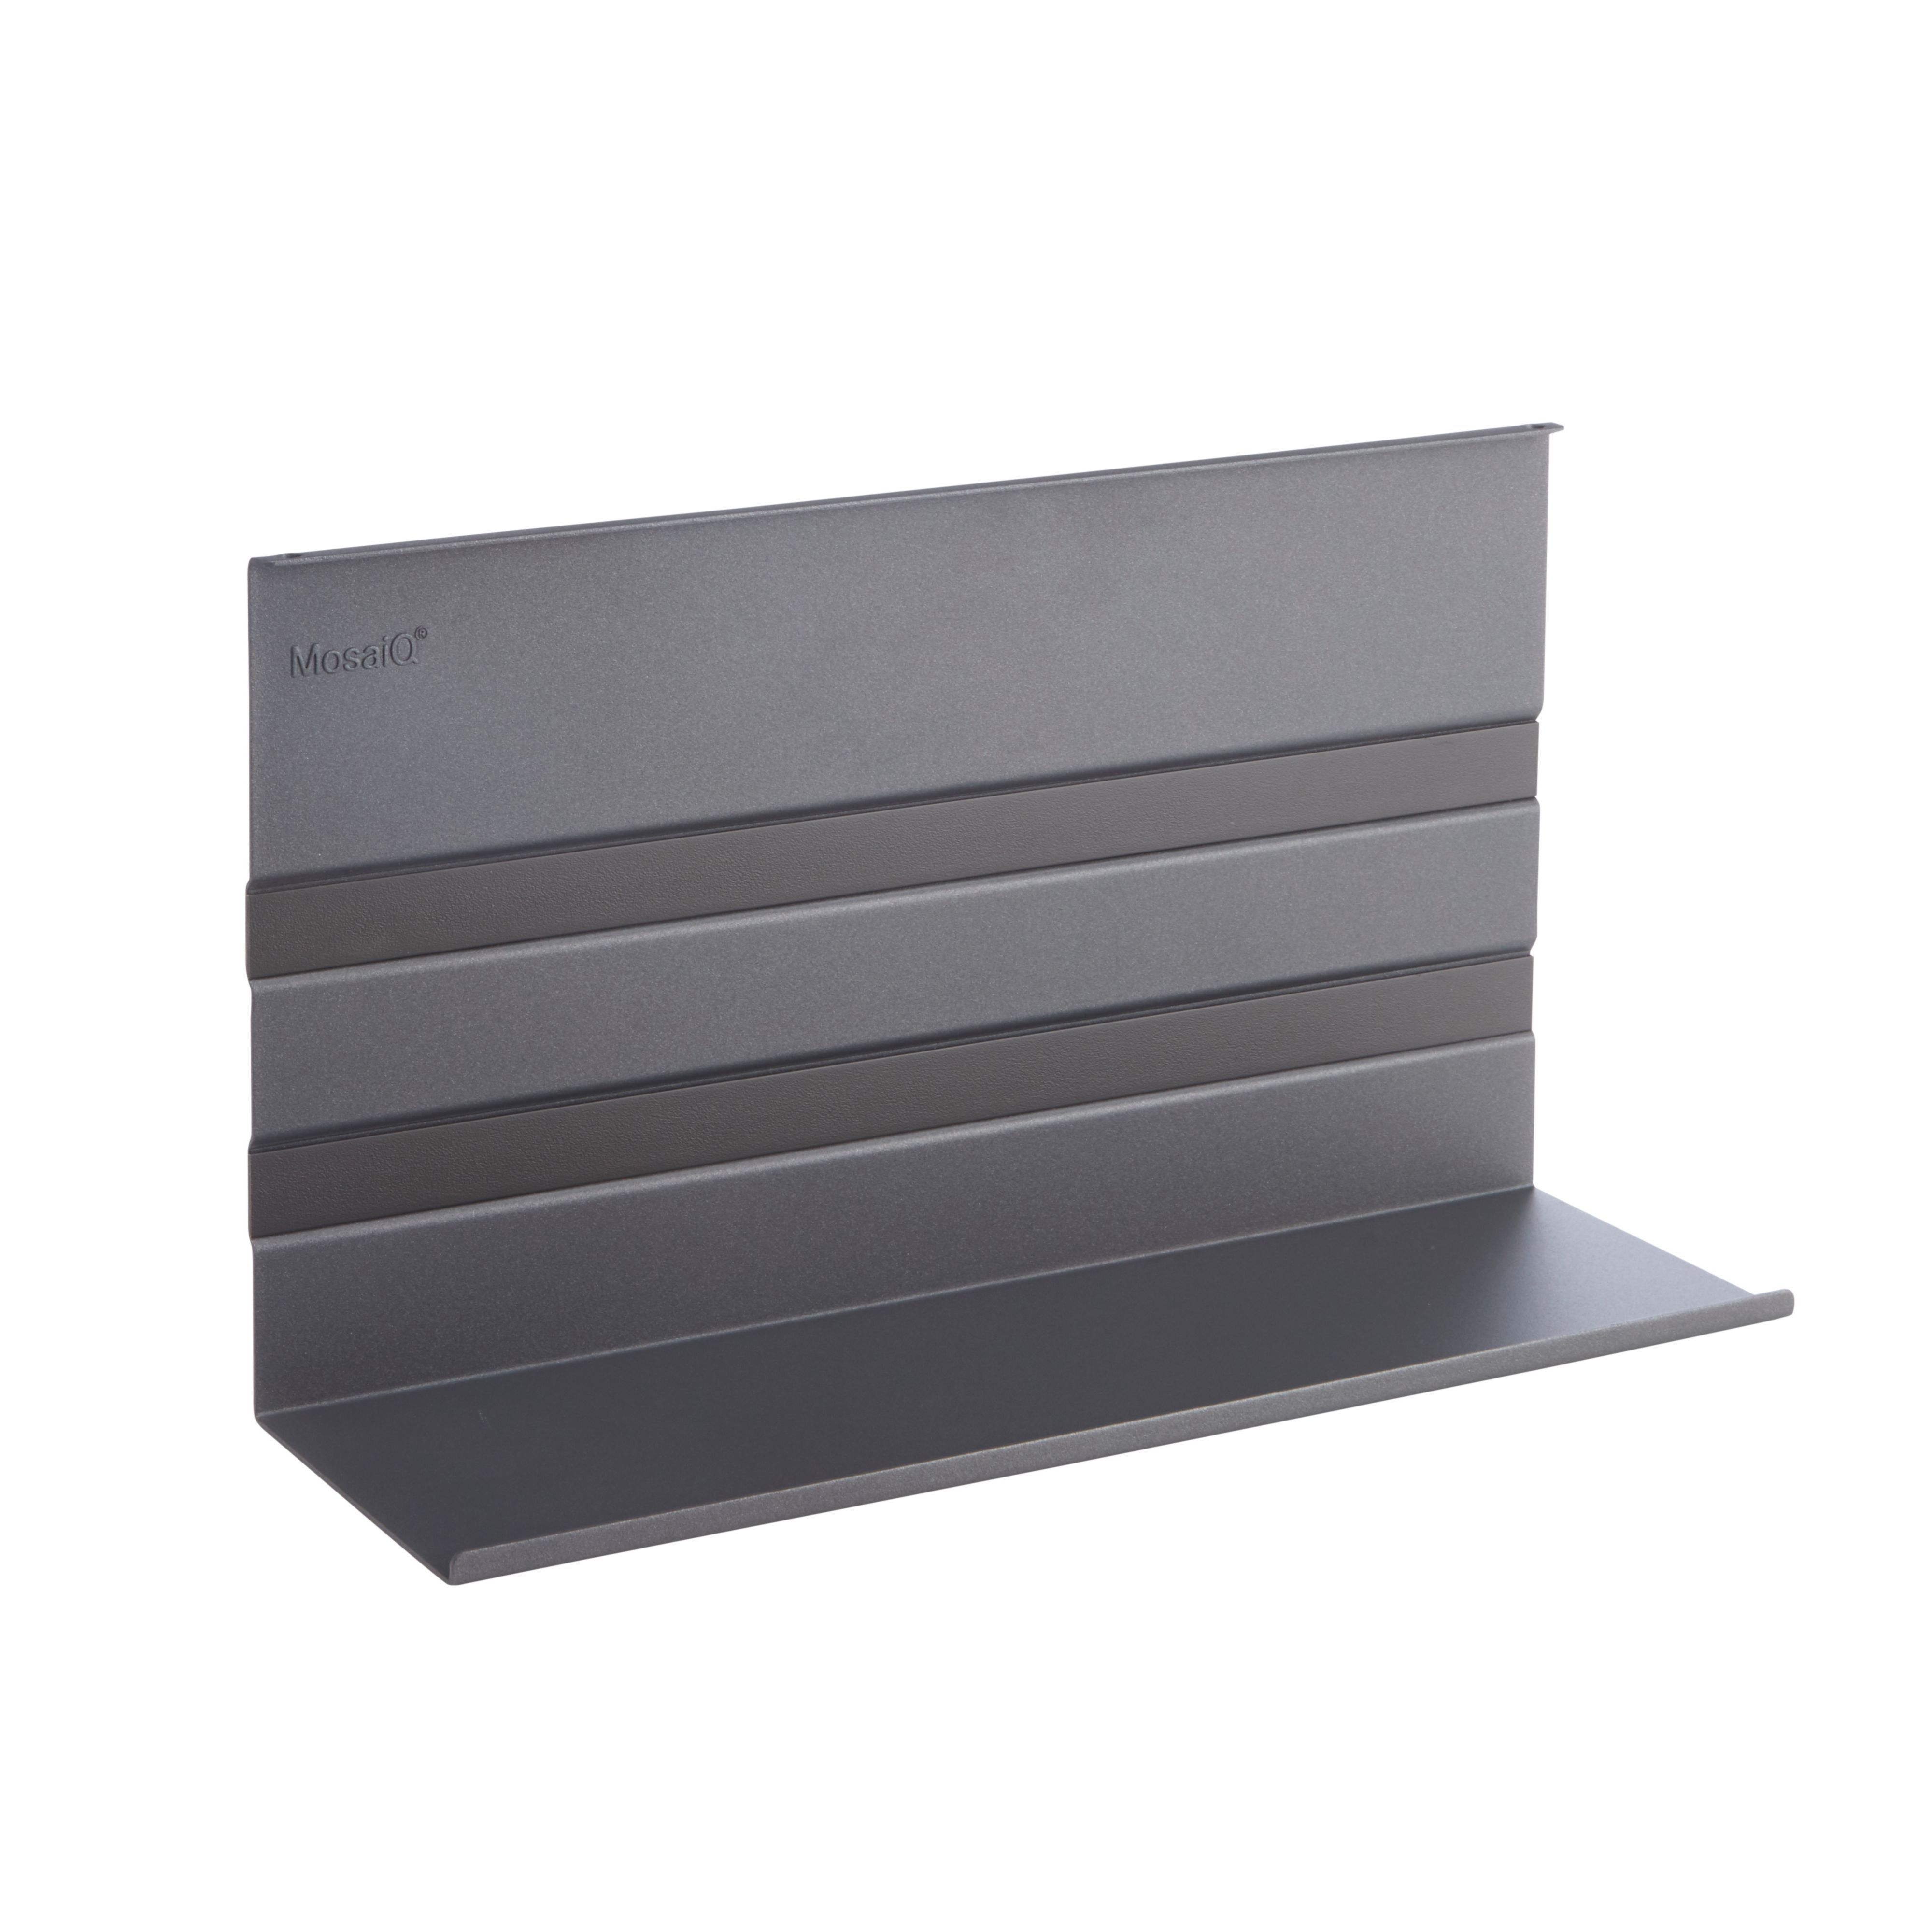 Kesseböhmer Linero Mosaiq Brushed Silver Effect Shelf (h)200mm